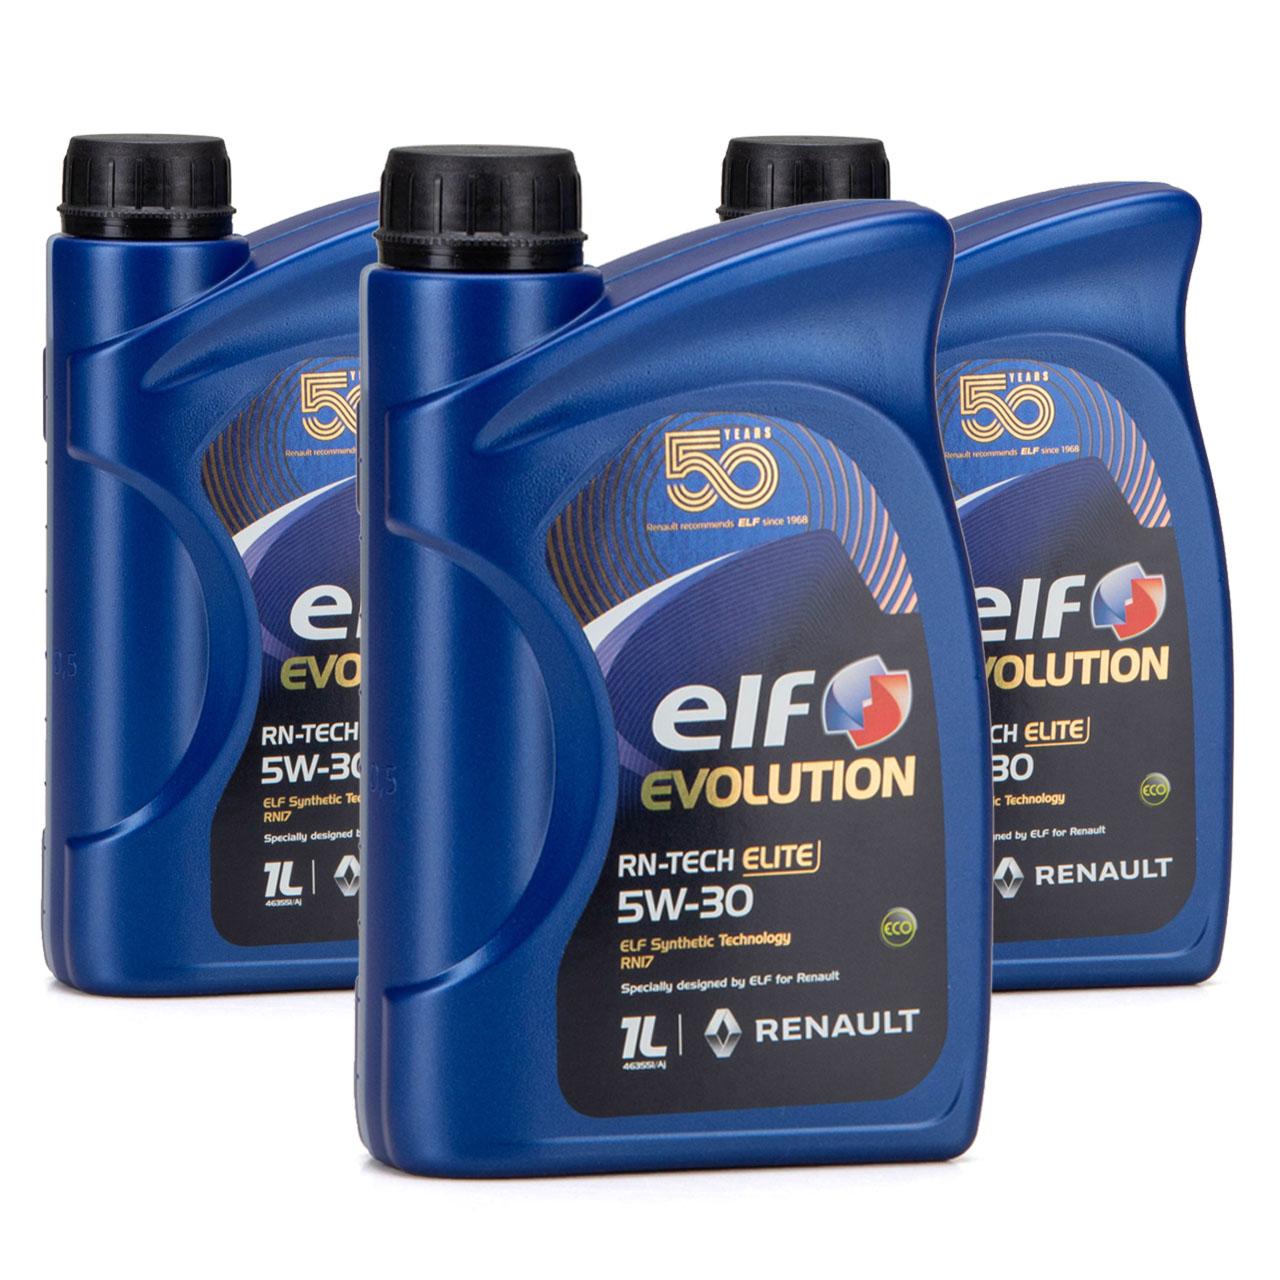 elf Evolution RN-TECH ELITE 5W-30 5W30 Motoröl Öl C3 Renault RN17 - 3L 3 Liter